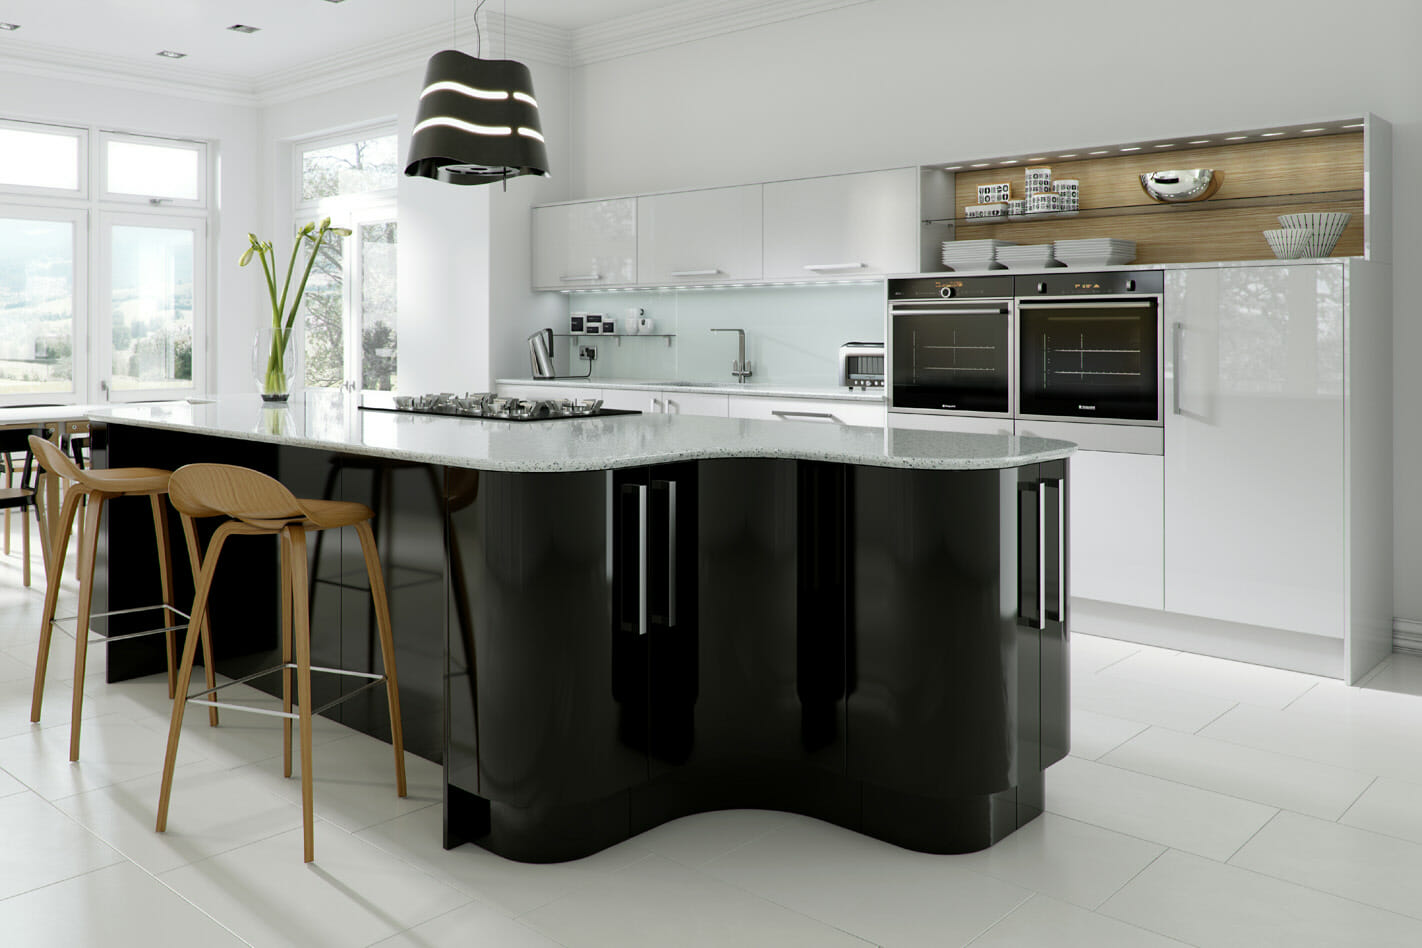 Haddington Black Gloss Mastercraft Kitchens